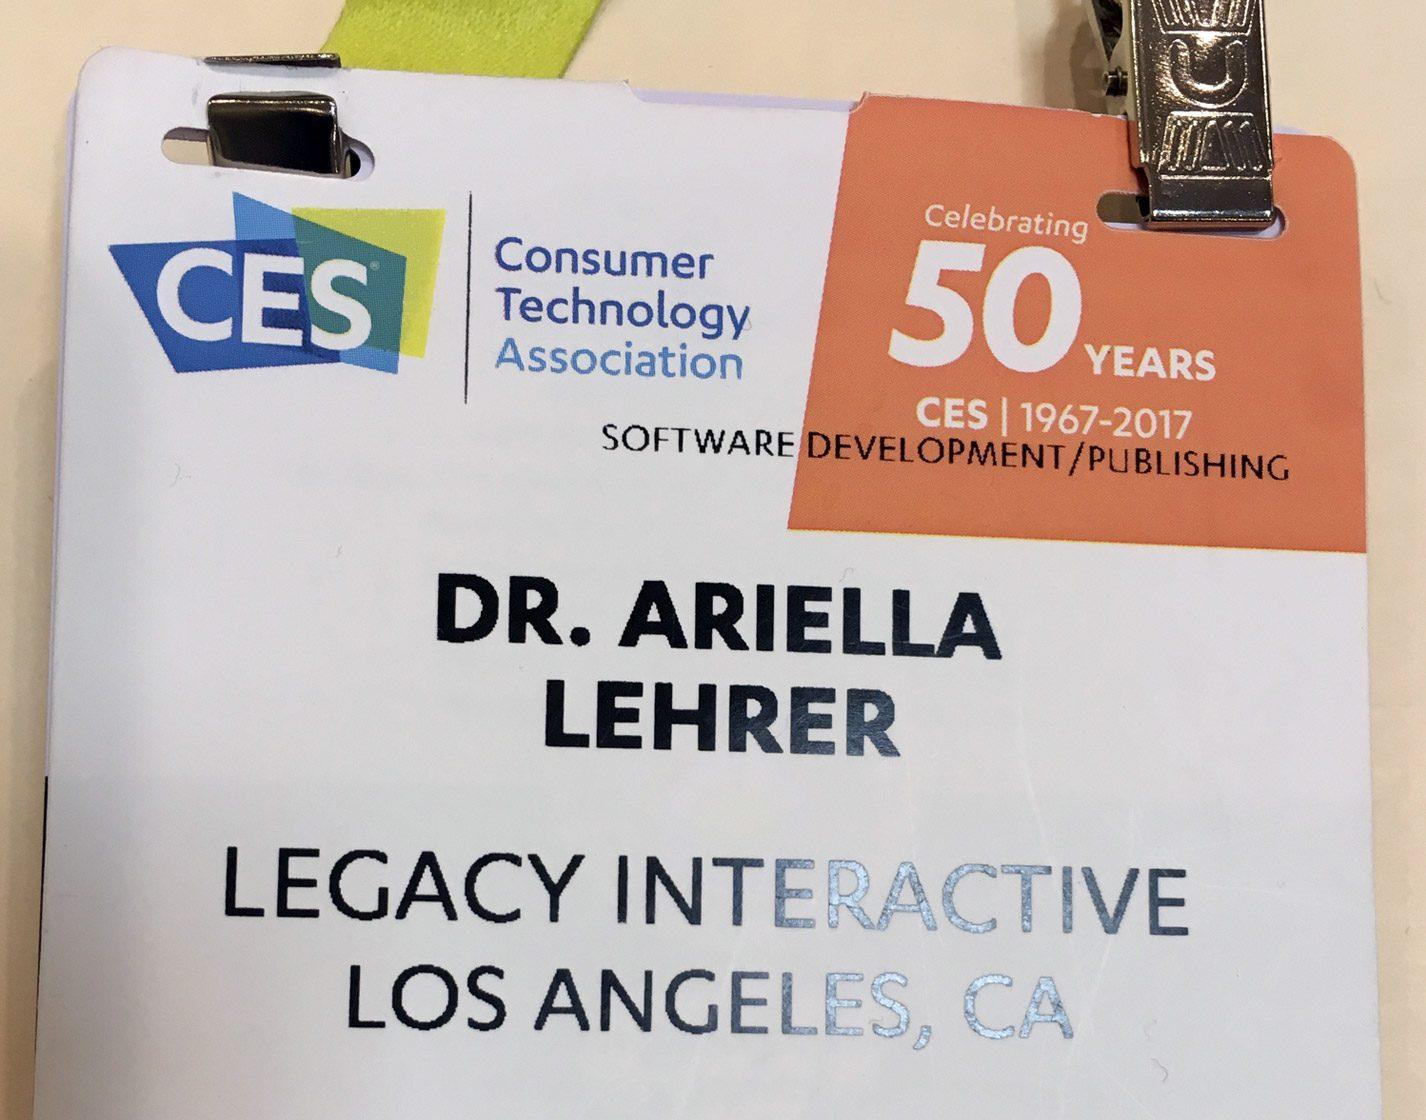 CES 2017 badge